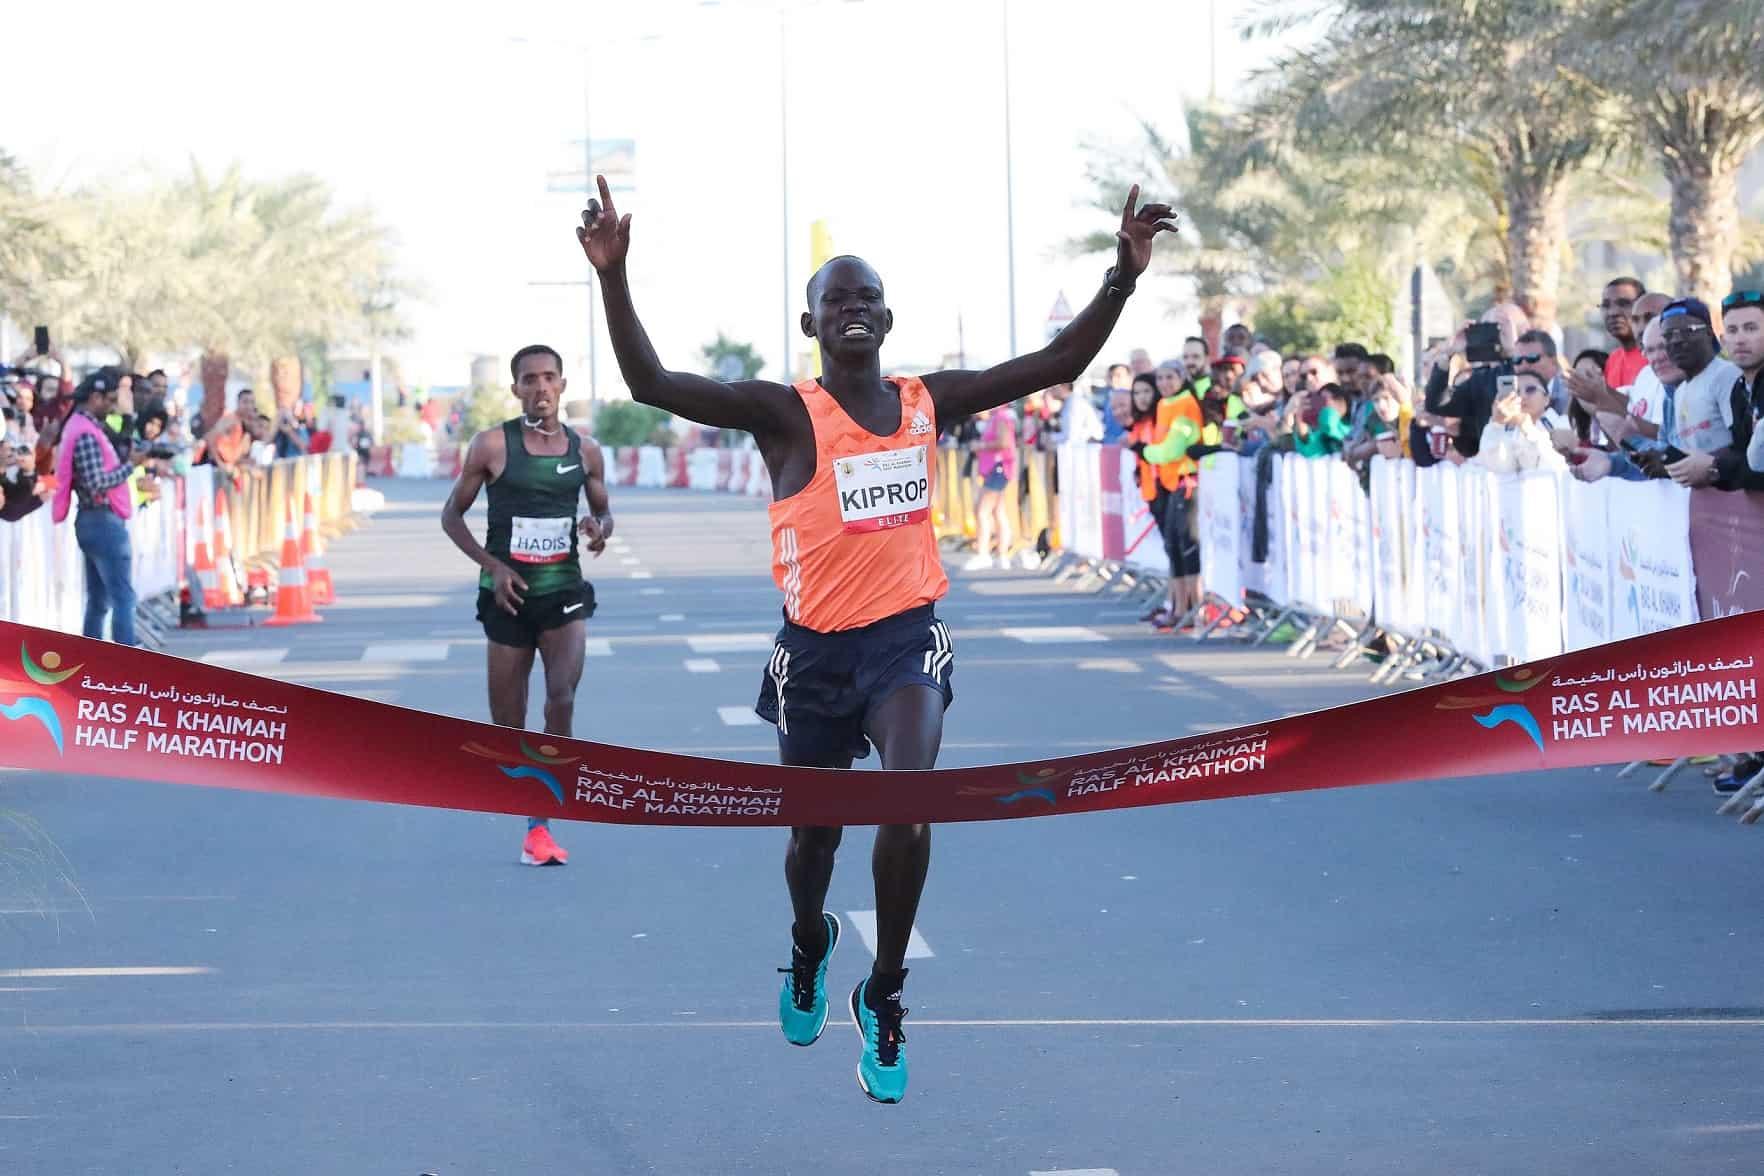 Kiprop_StephenElite male category winner crossing finish line